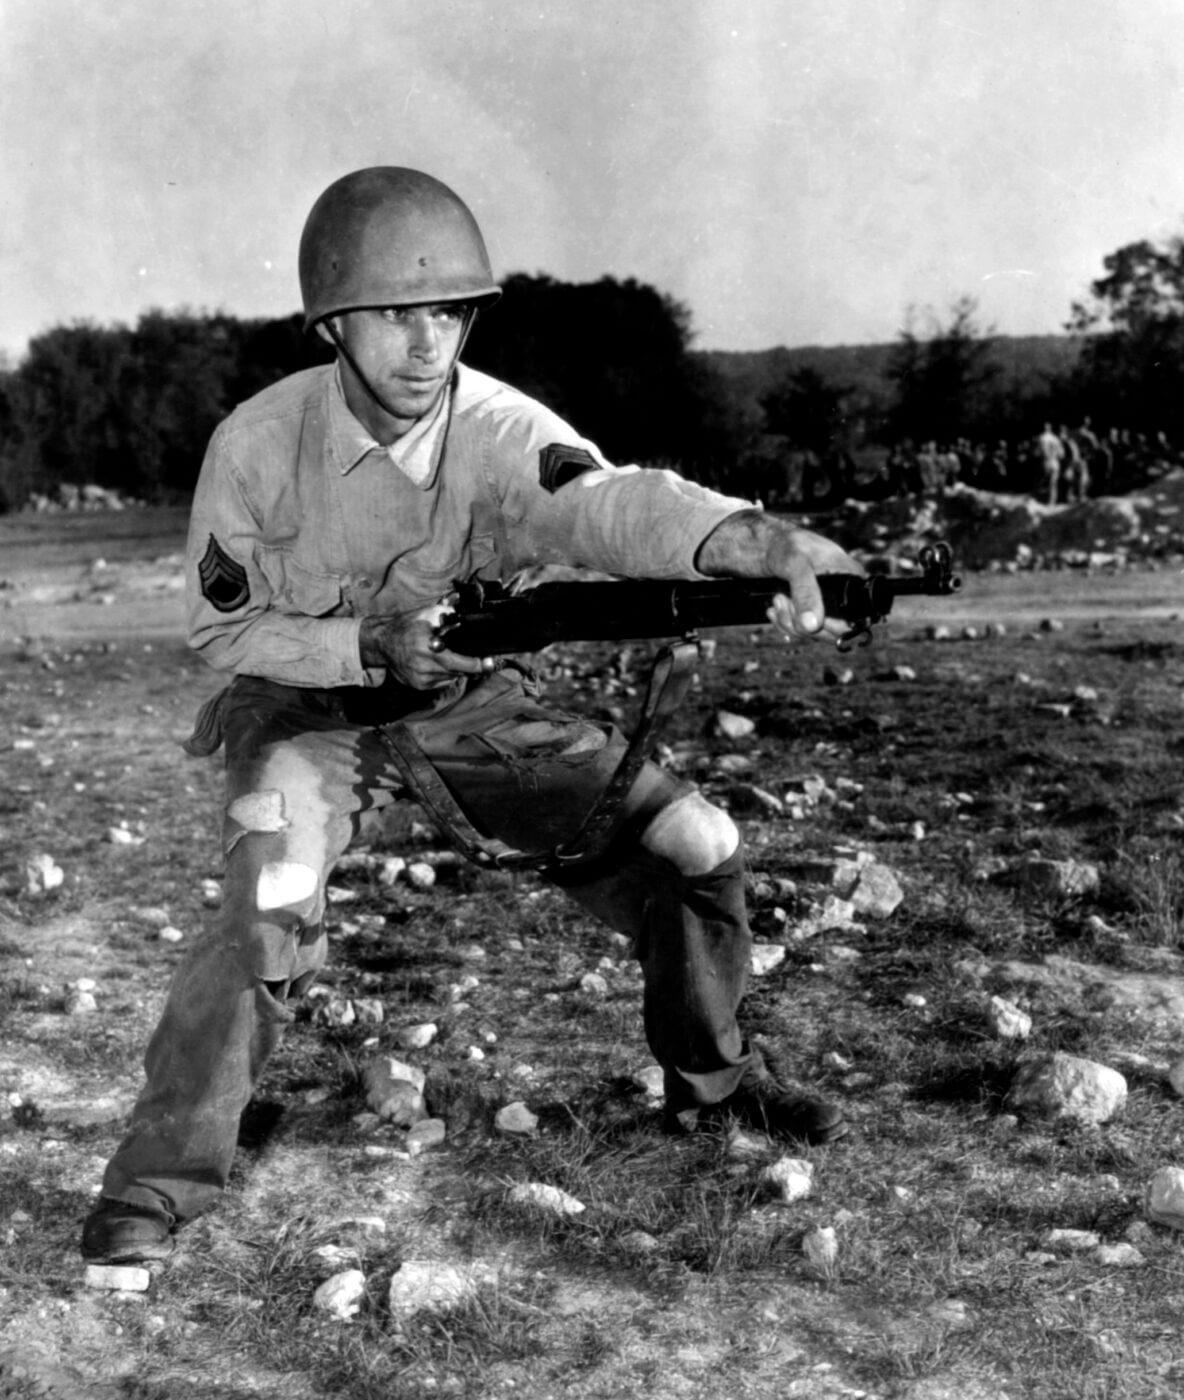 Ft. Hood U.S. Army soldier training